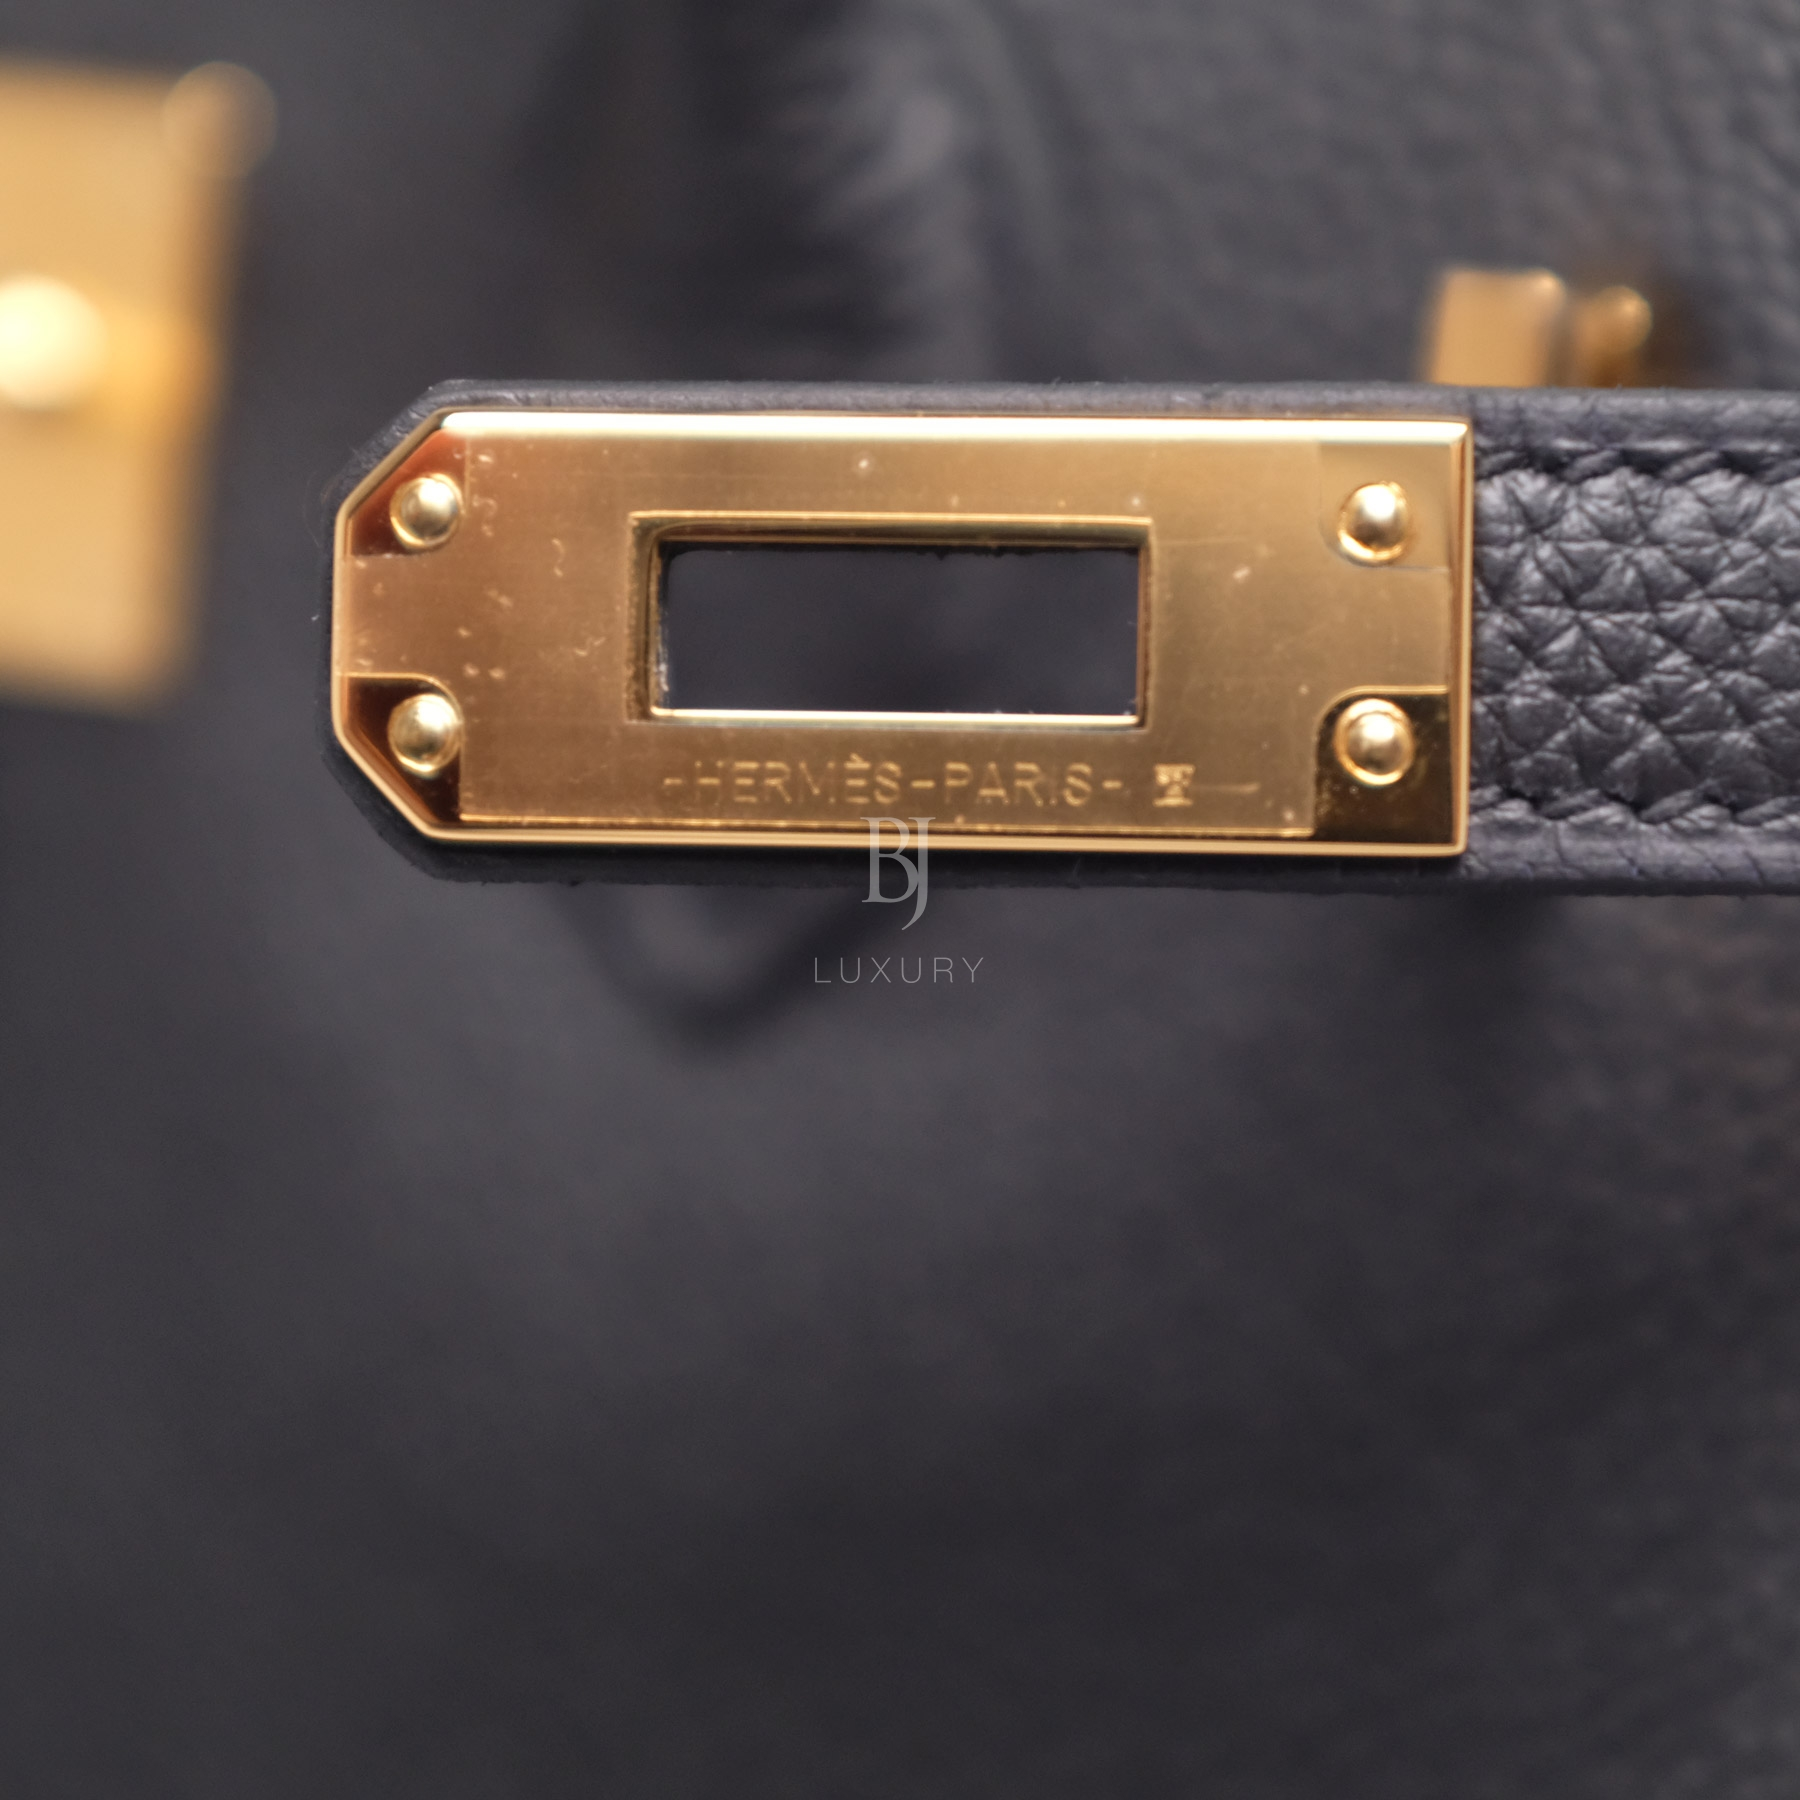 Hermes Birkin 25 Black Togo Gold Hardware BJ Luxury 5.jpg